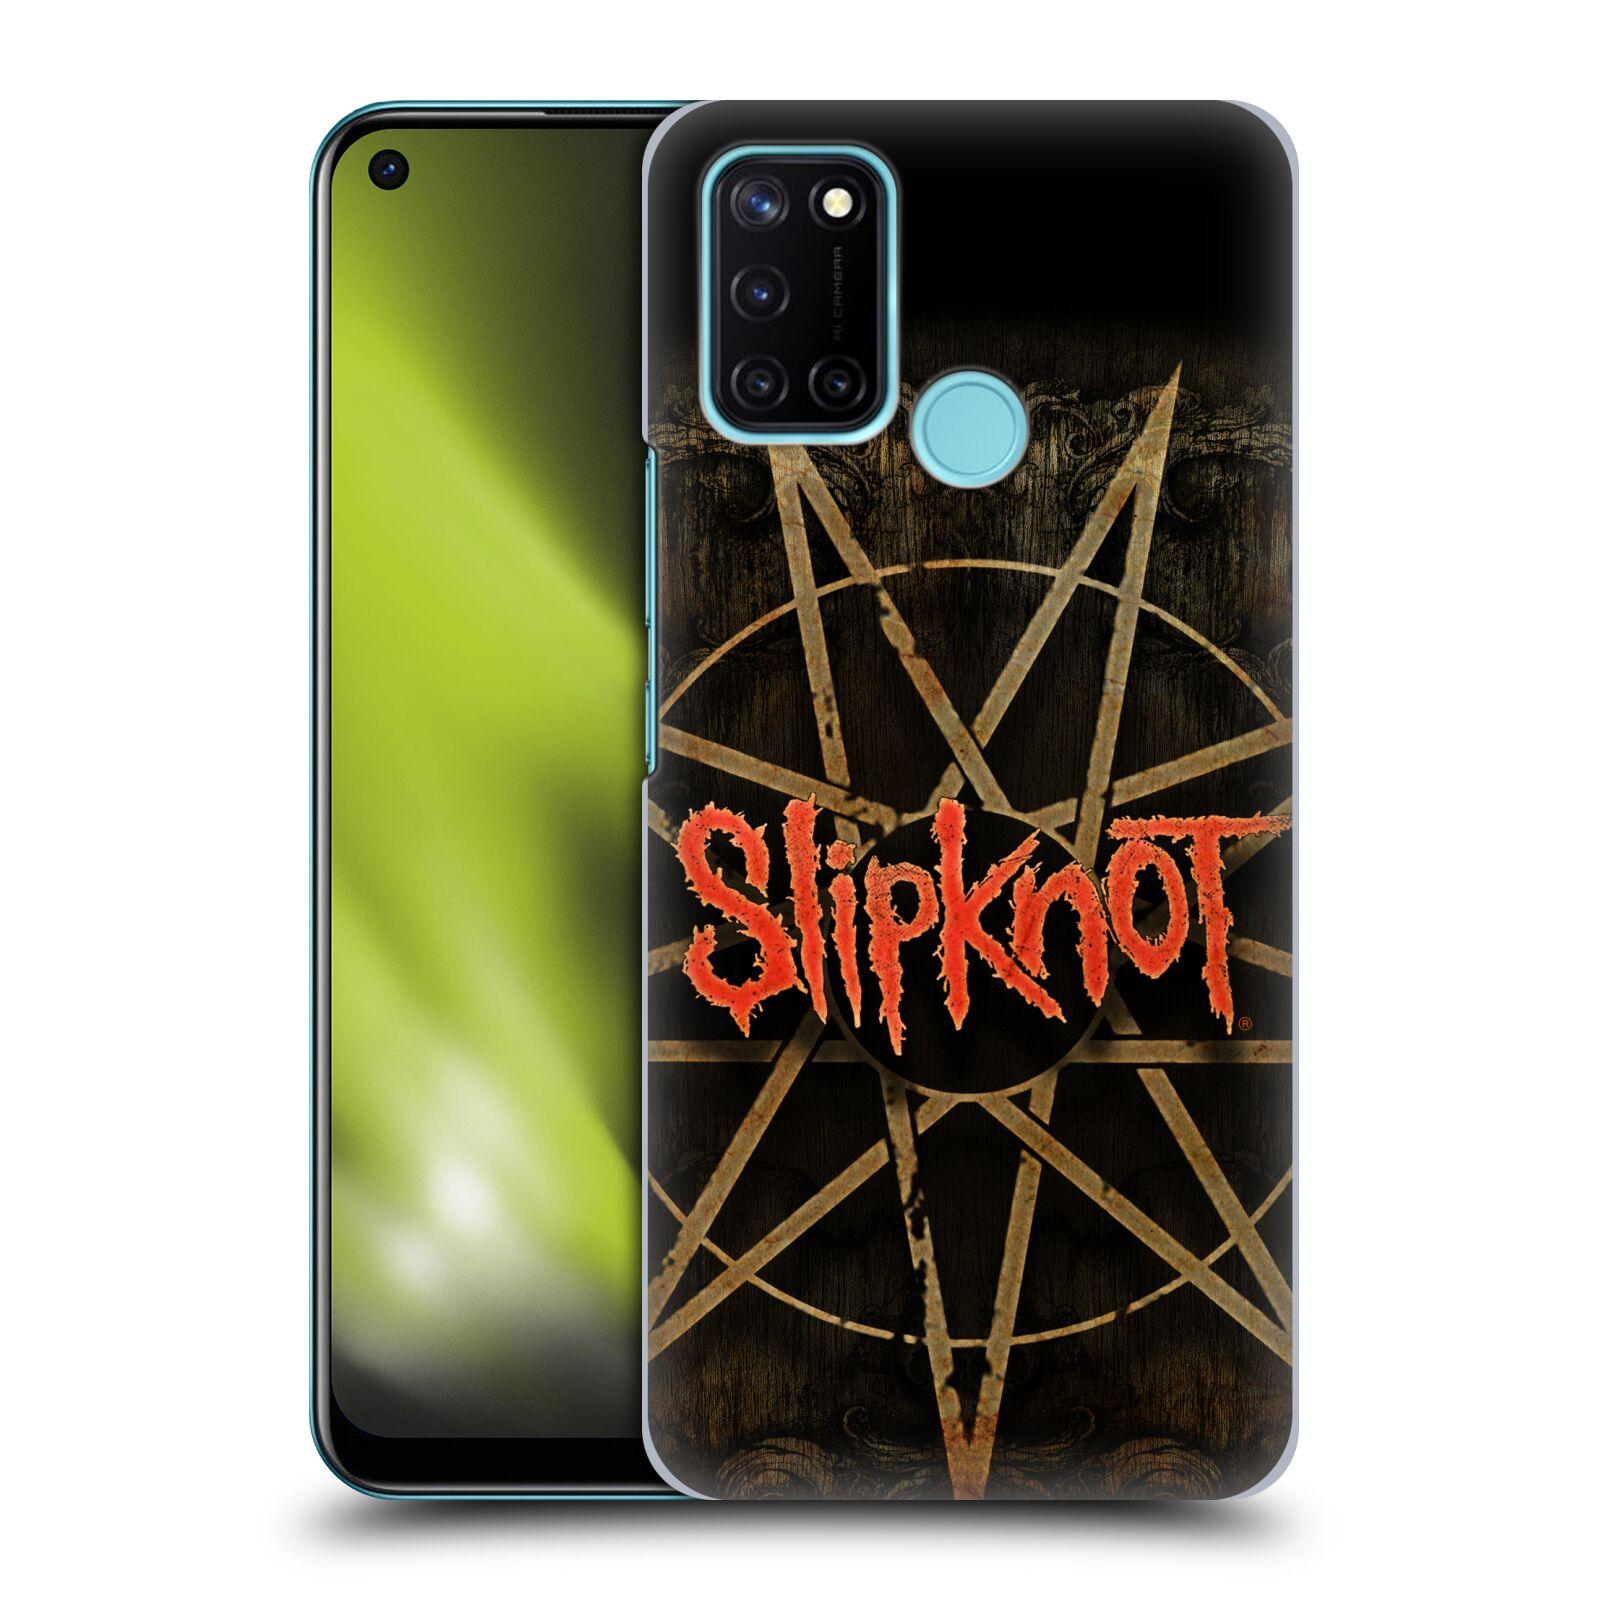 Plastové pouzdro na mobil Realme 7i - Head Case - Slipknot - Znak